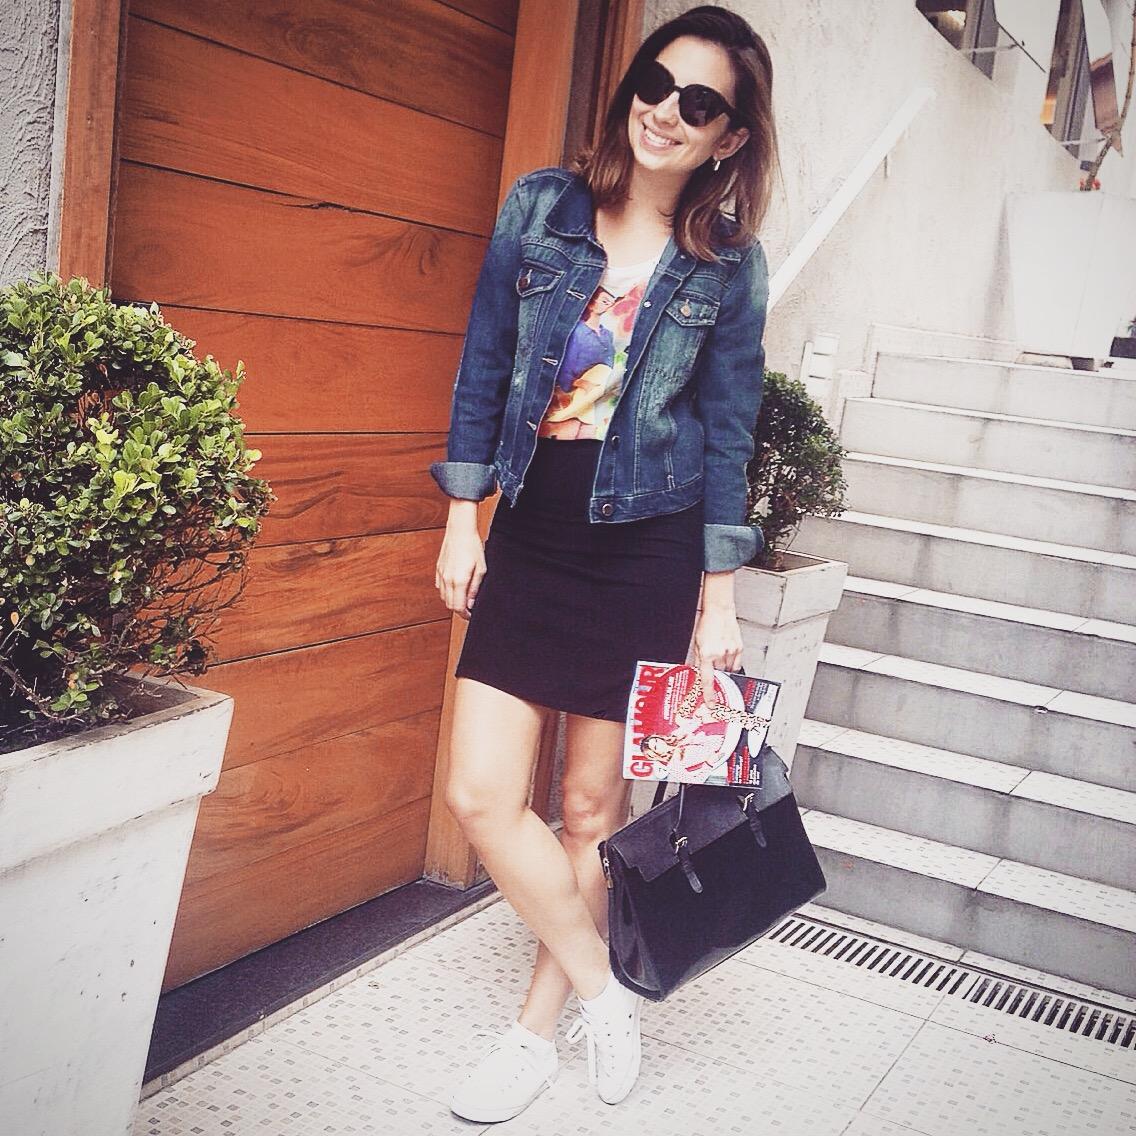 Van-duarte-meus-looks-instagram (5)